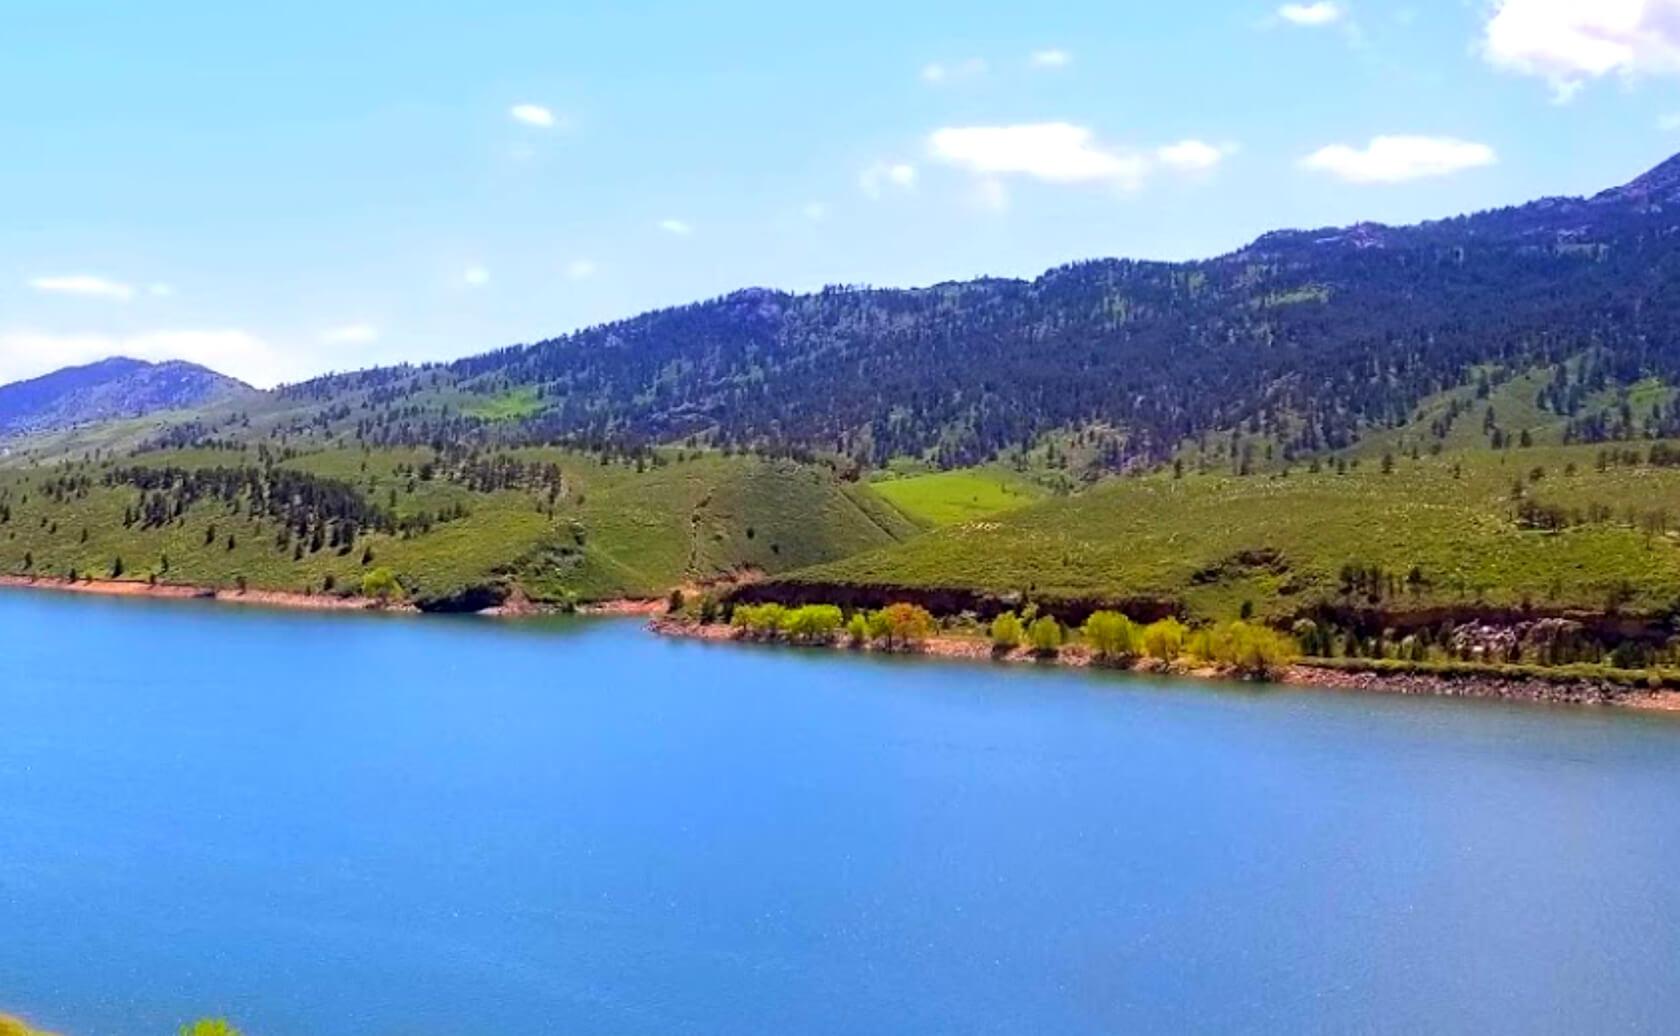 Horsetooth-Lake-Fishing-Guide-Report-Colorado-01